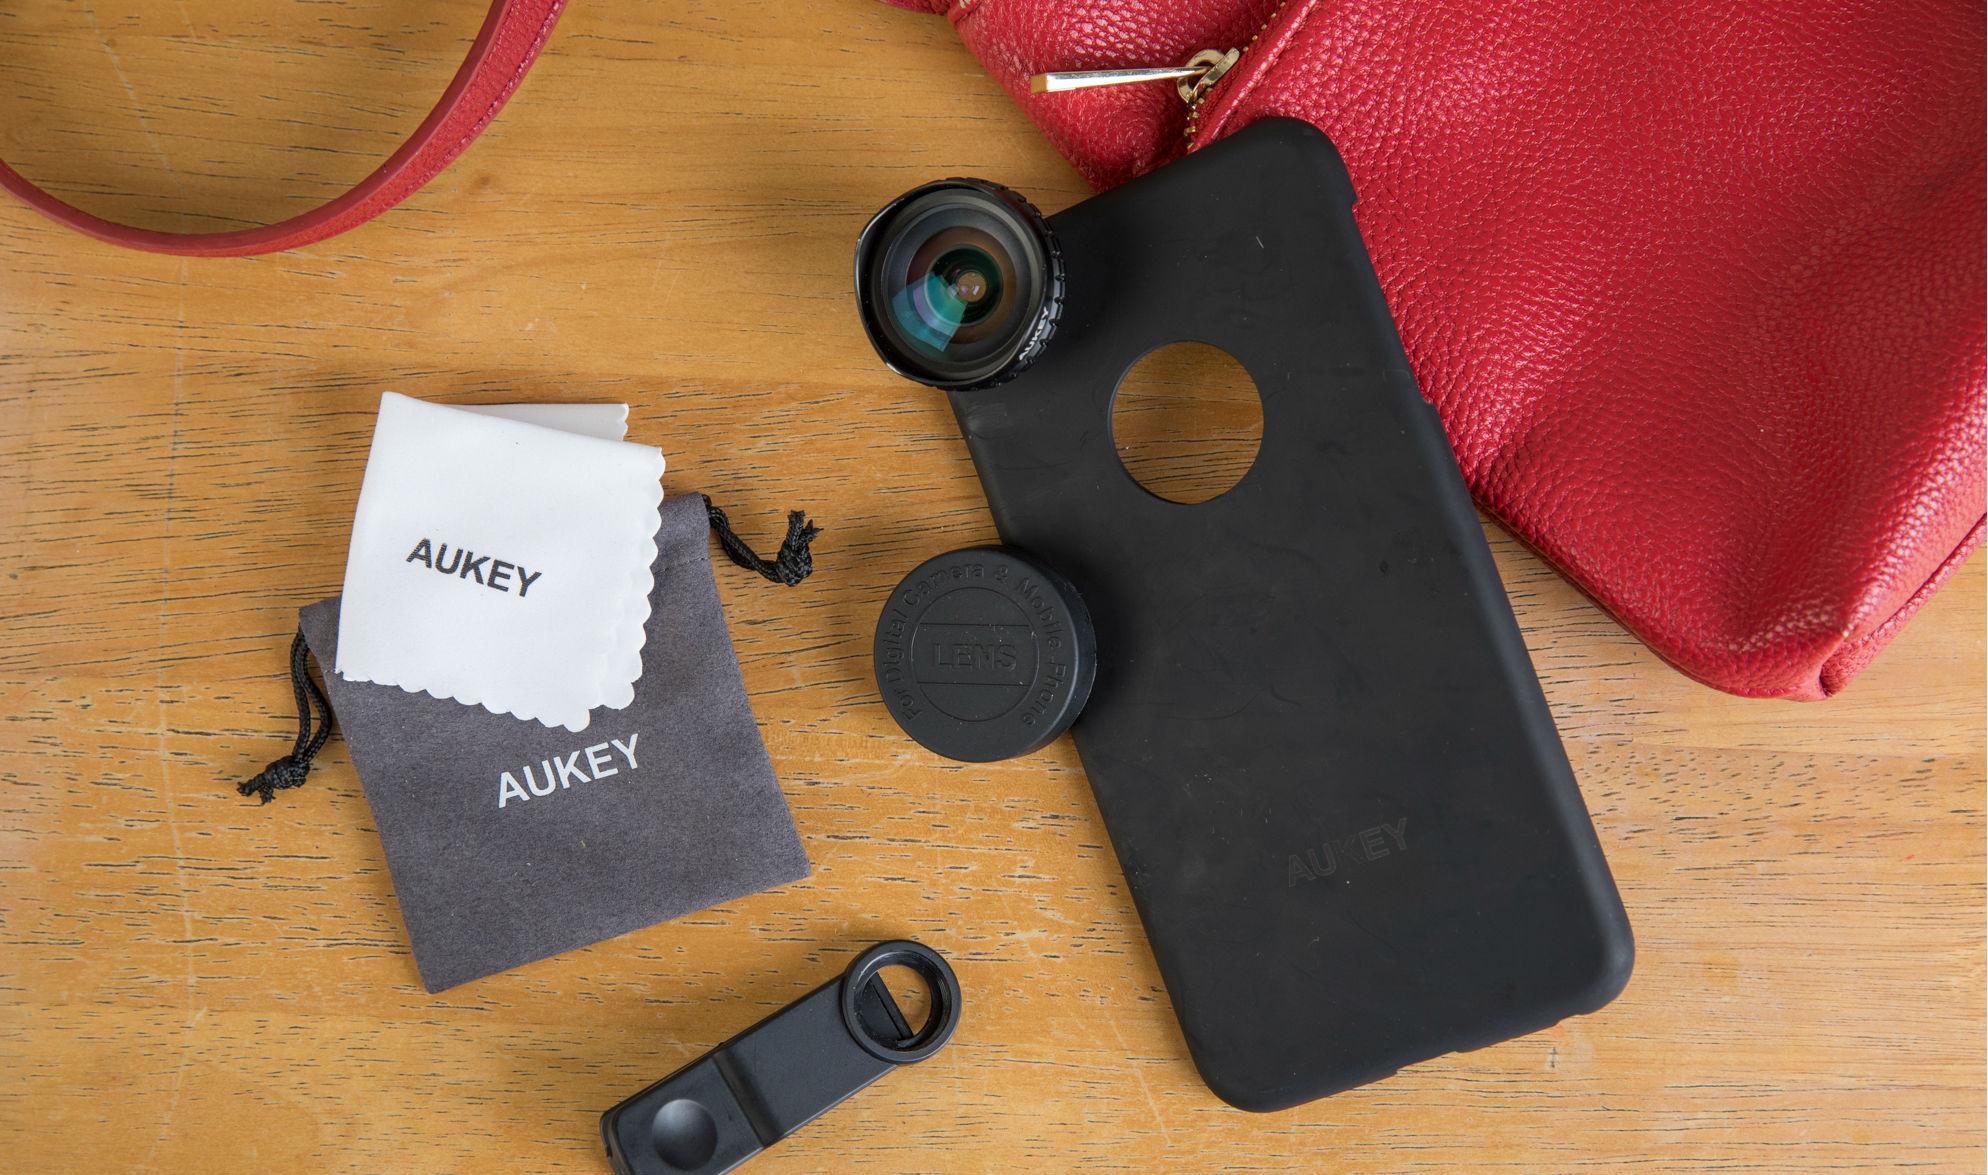 iphone-Aukey lens